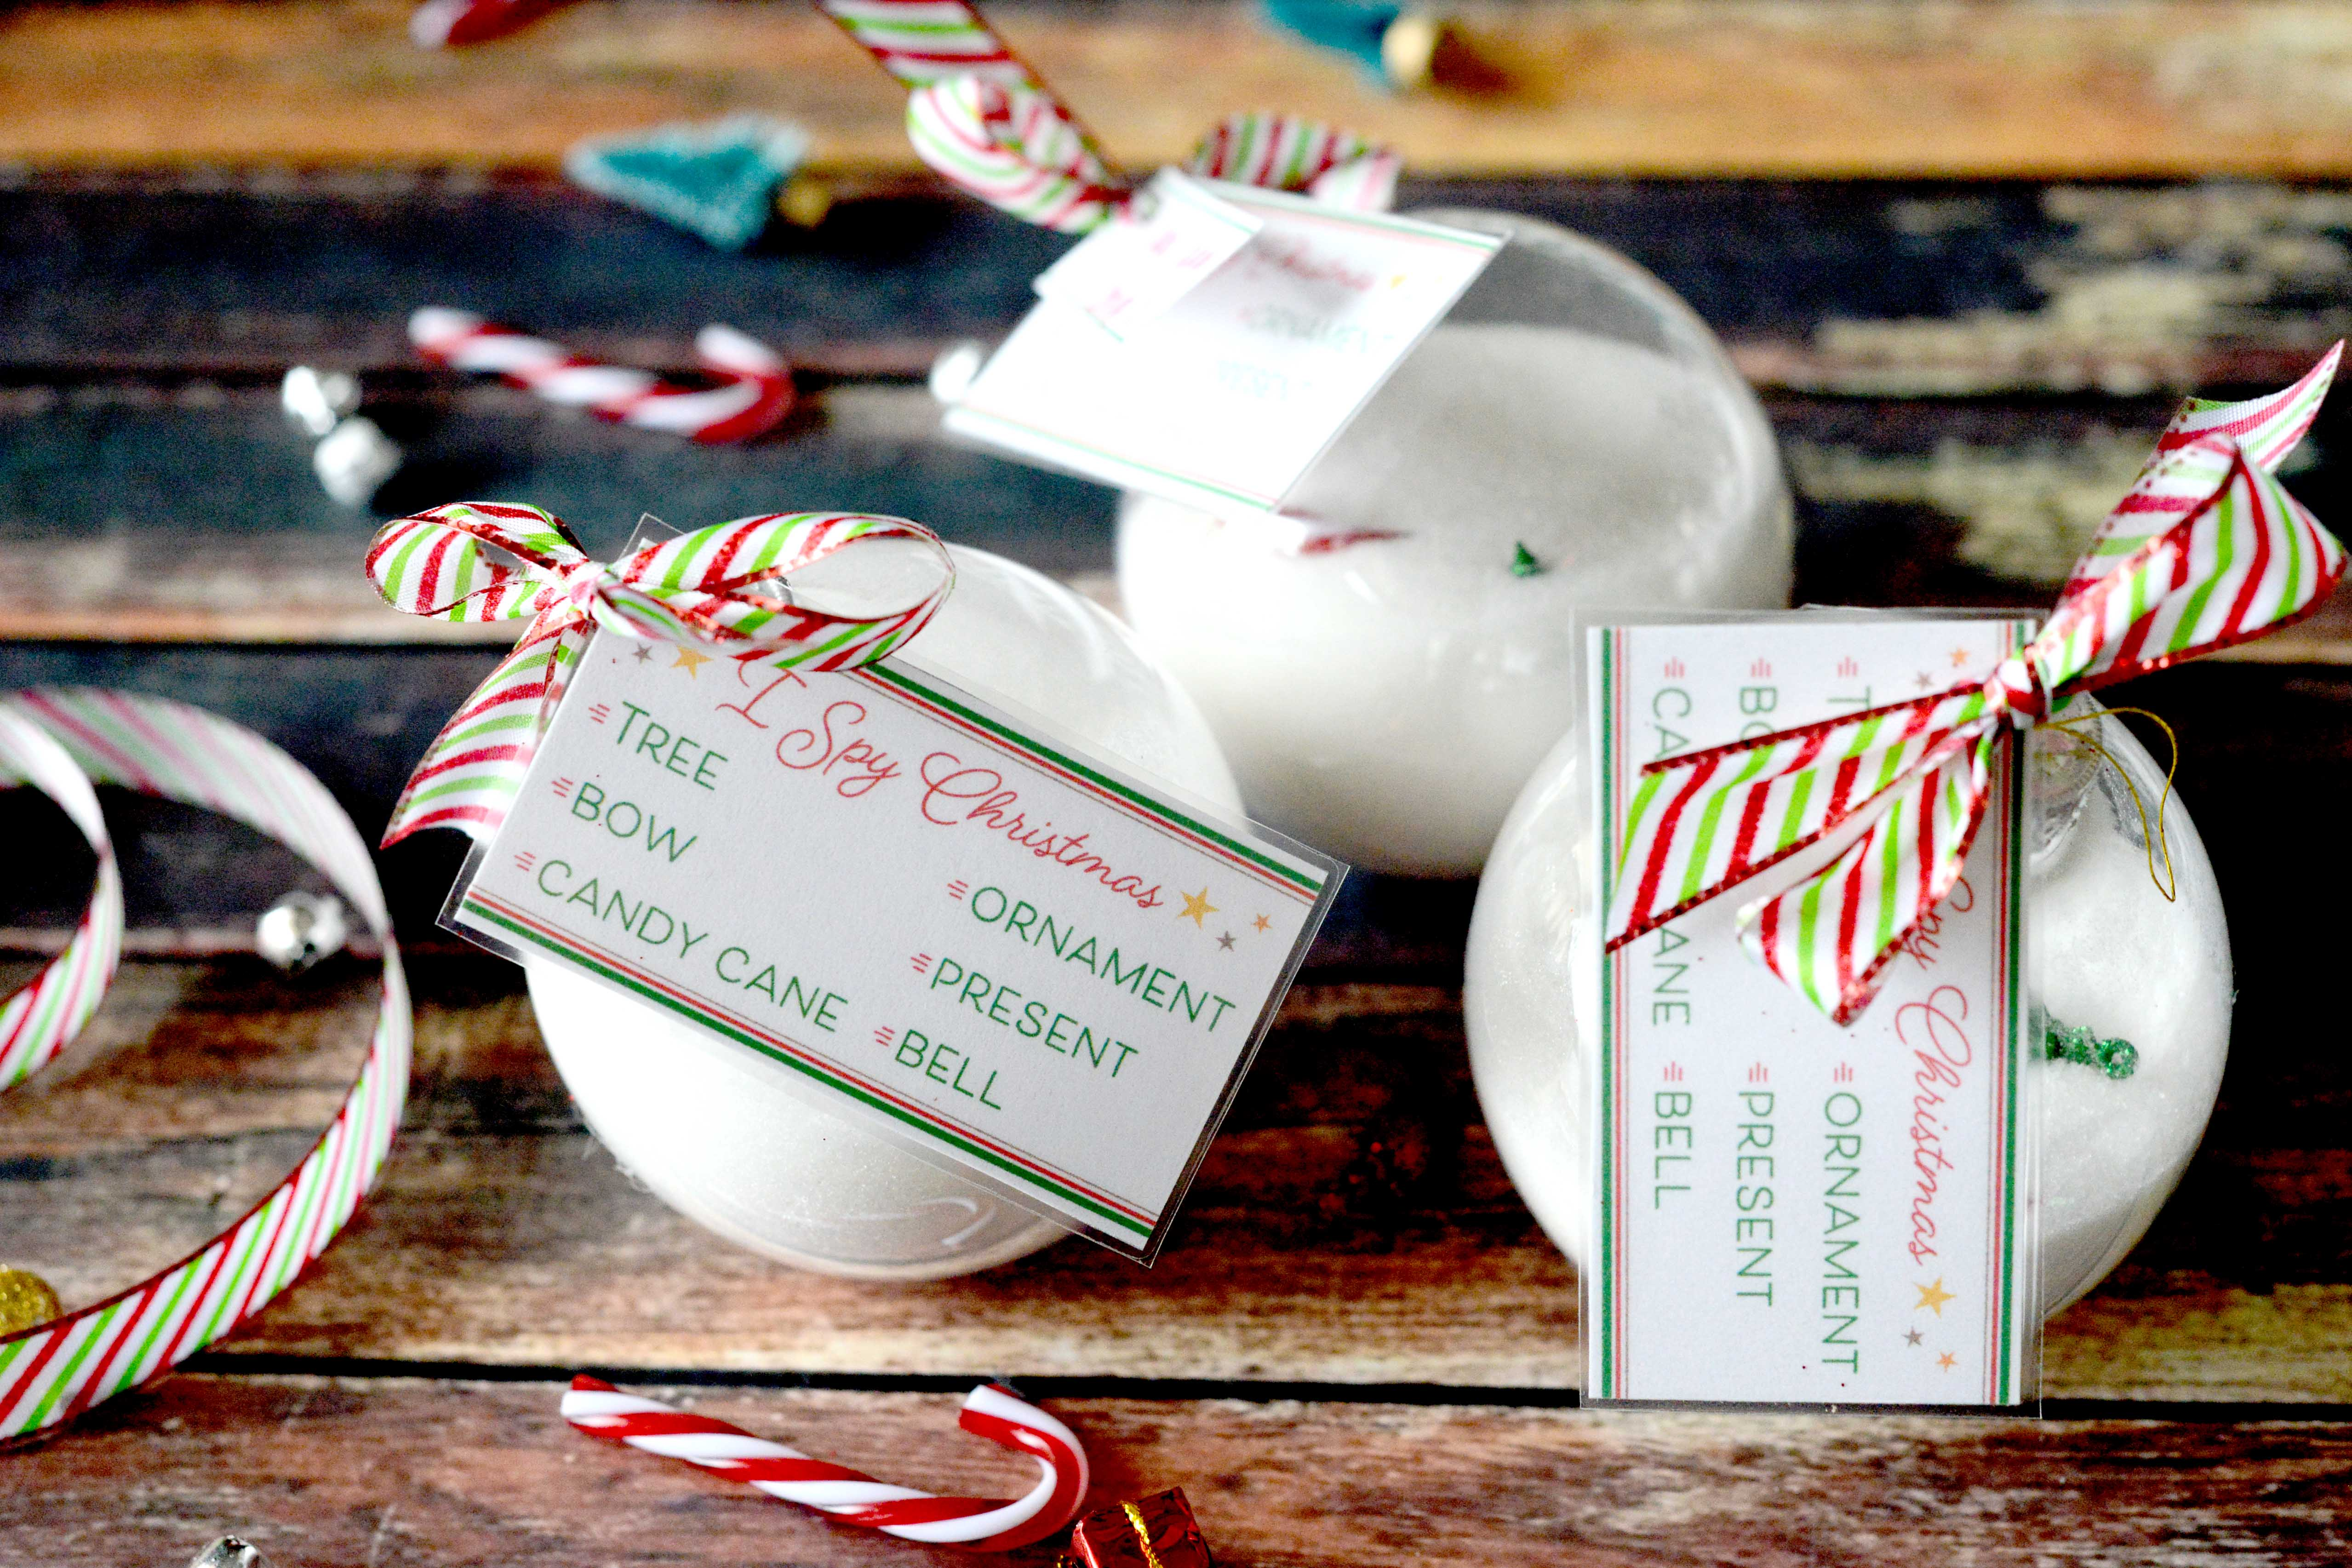 December 2017 visiting teaching printable handout teepee girl i spy christmas ornamentchristmas gift craft idea for kids teepeegirl negle Images